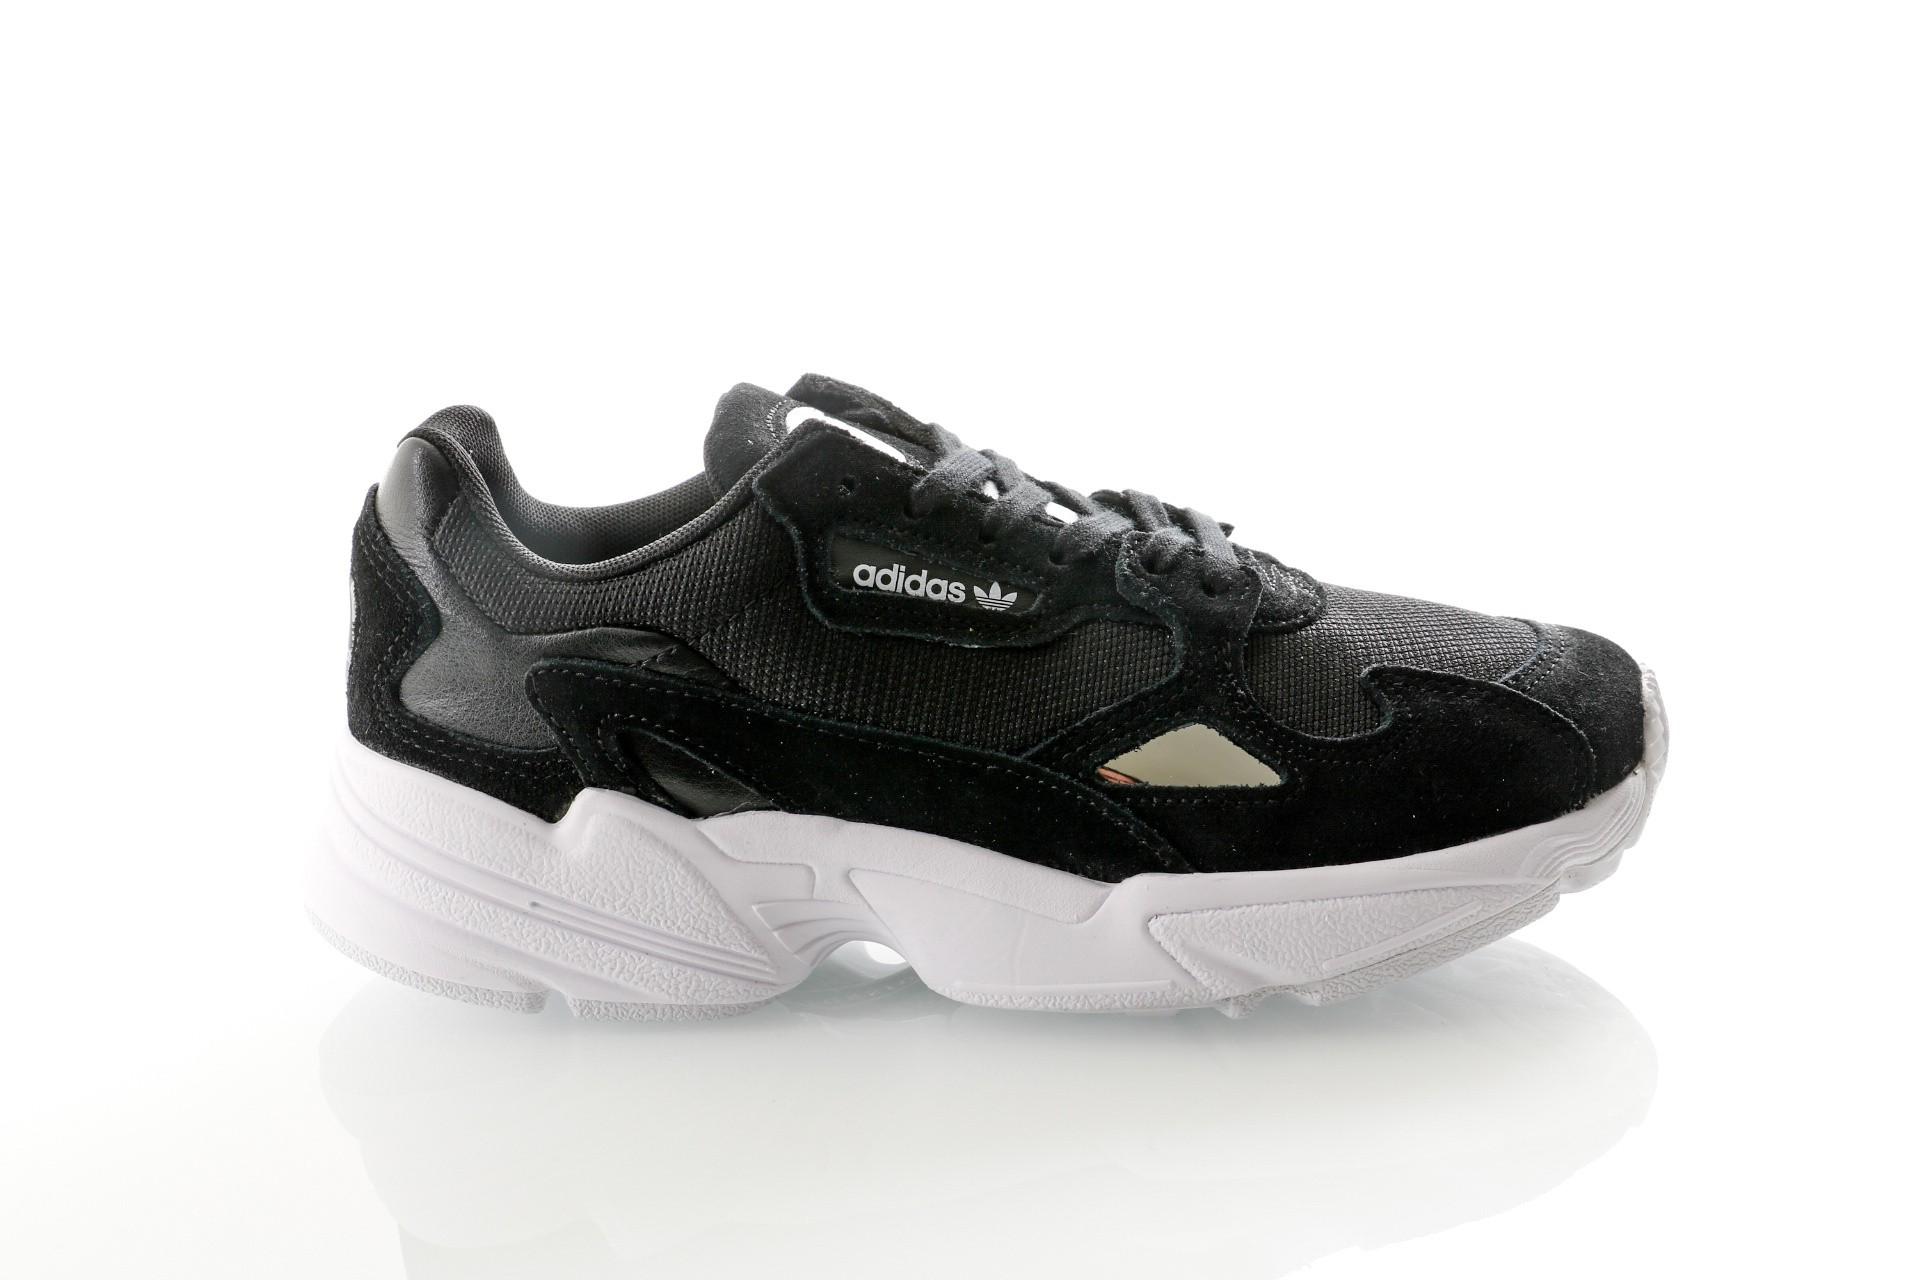 reputable site 14409 e09ee Afbeelding van Adidas Falcon W B28129 Sneakers Core Black Core Black Ftwr  White